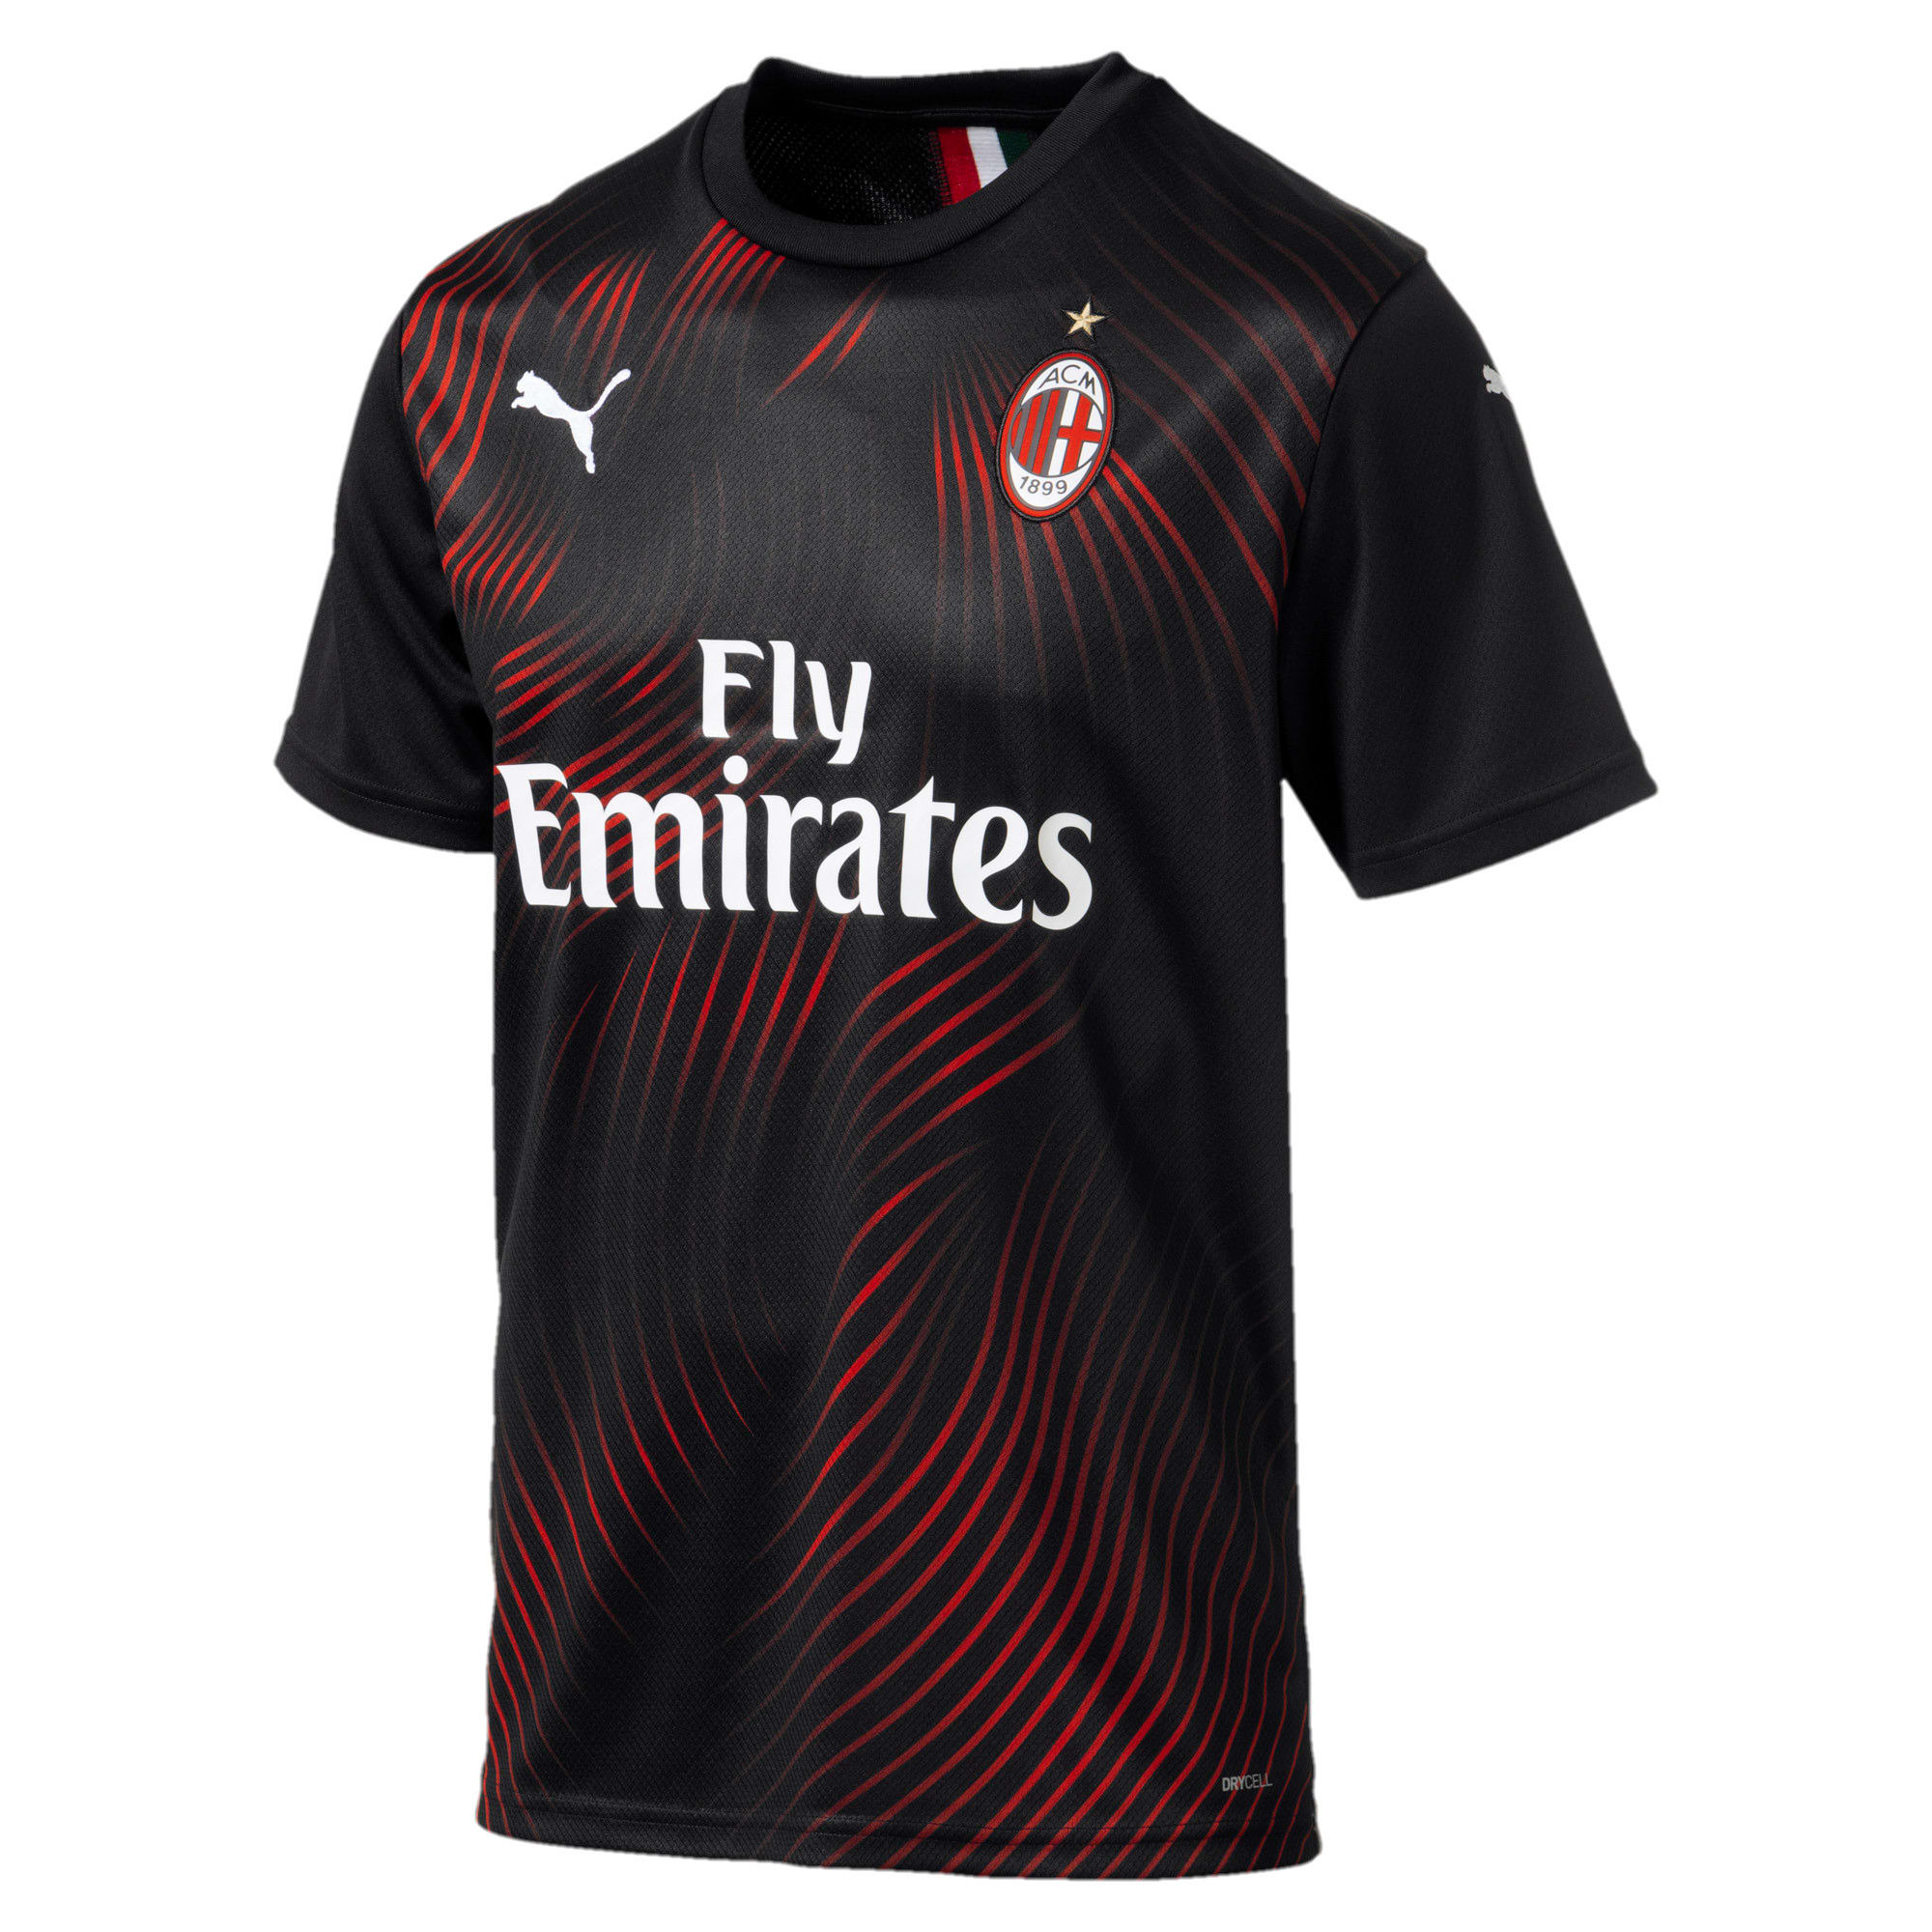 Thumbnail 4 of AC Milan Men's Third Replica Jersey, Puma Black-Tango Red, medium